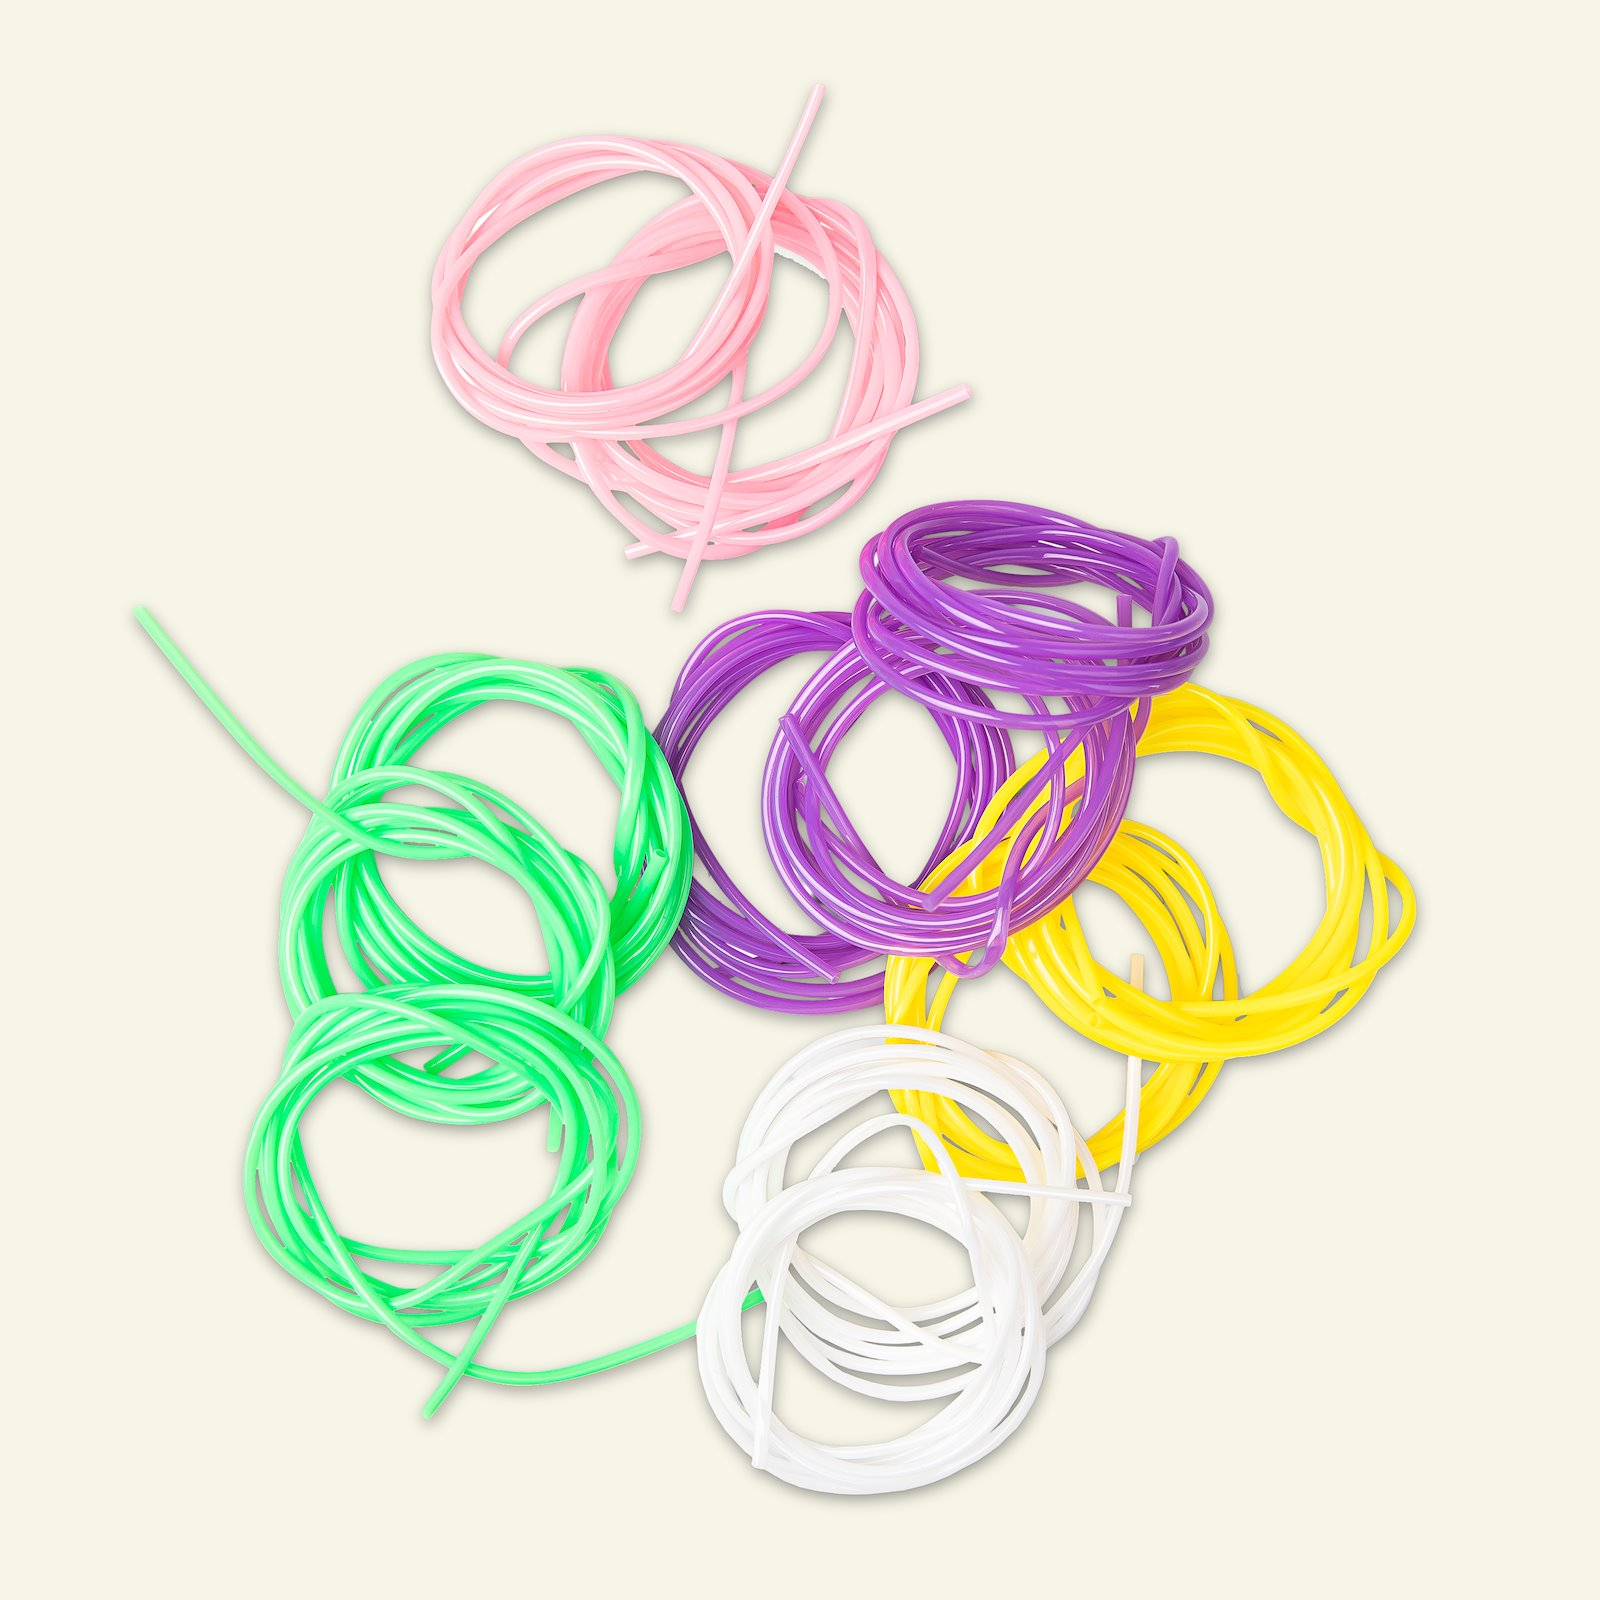 FRAYA stitch wire set 5 colours 12m 83306_pack